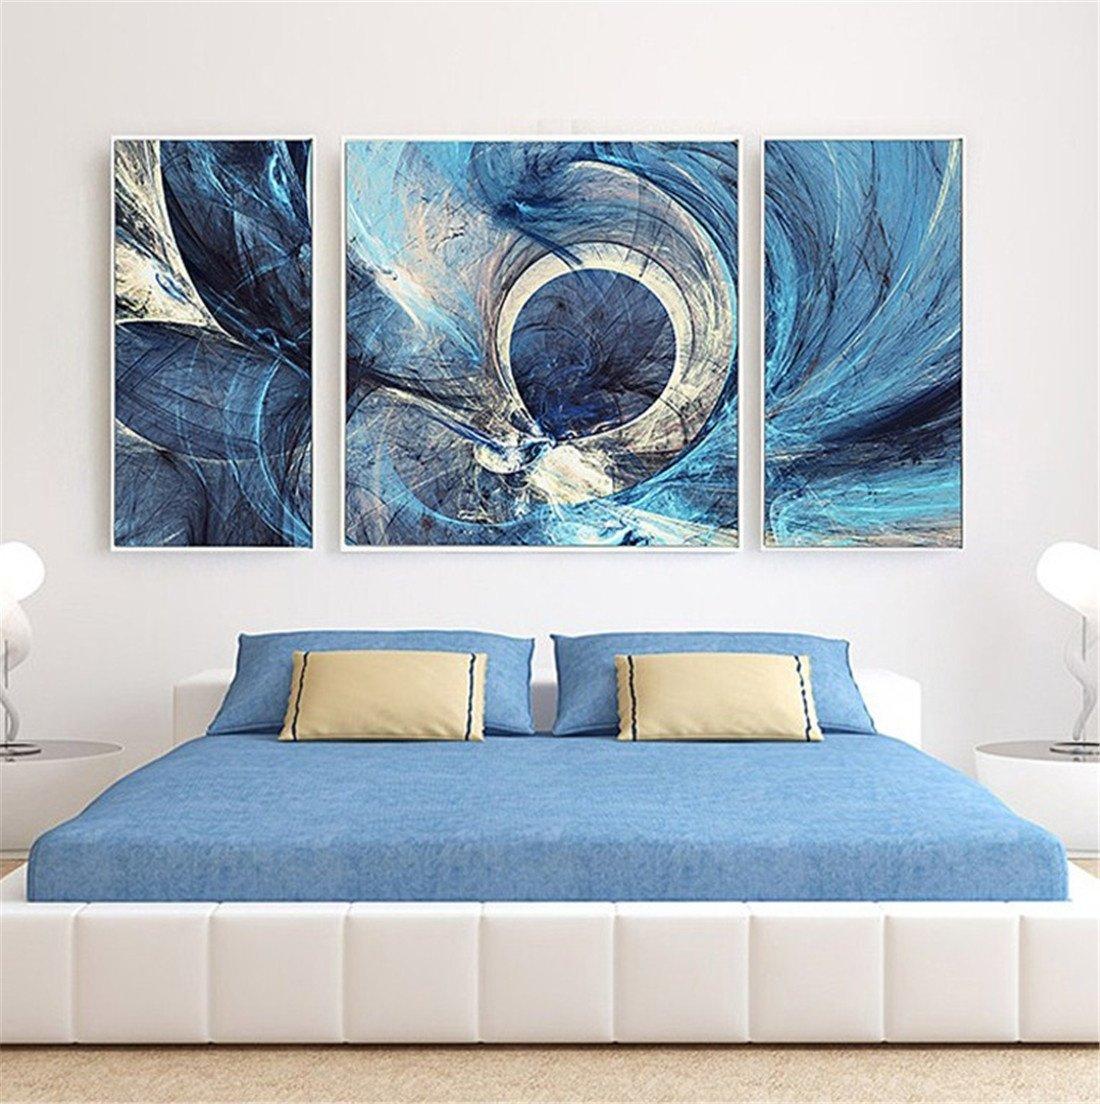 YIZHANGnórdico Abstracto Pintura Decorativa Sala de Estar Triple Pintura Moderna Simple atmosférico murales sofá Fondo Pared Pintura al óleo